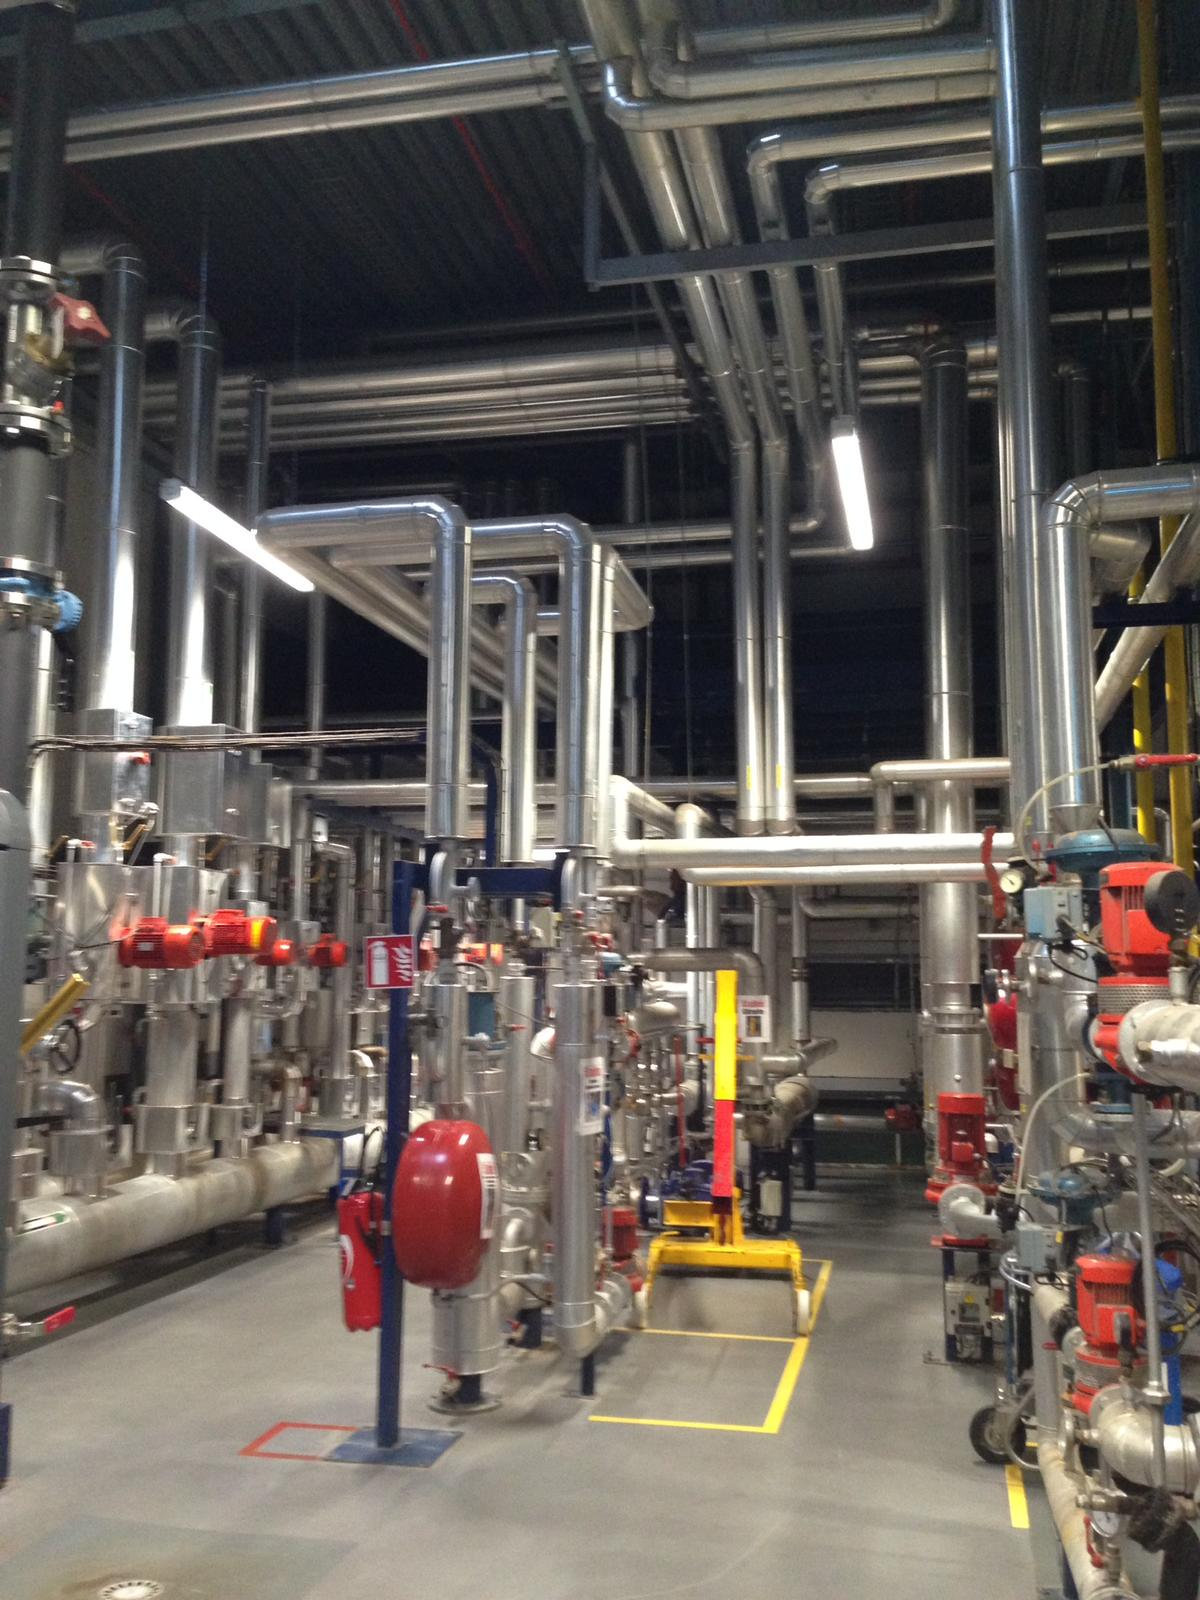 Chauffage industriel : Pourquoi un chauffage industriel ?